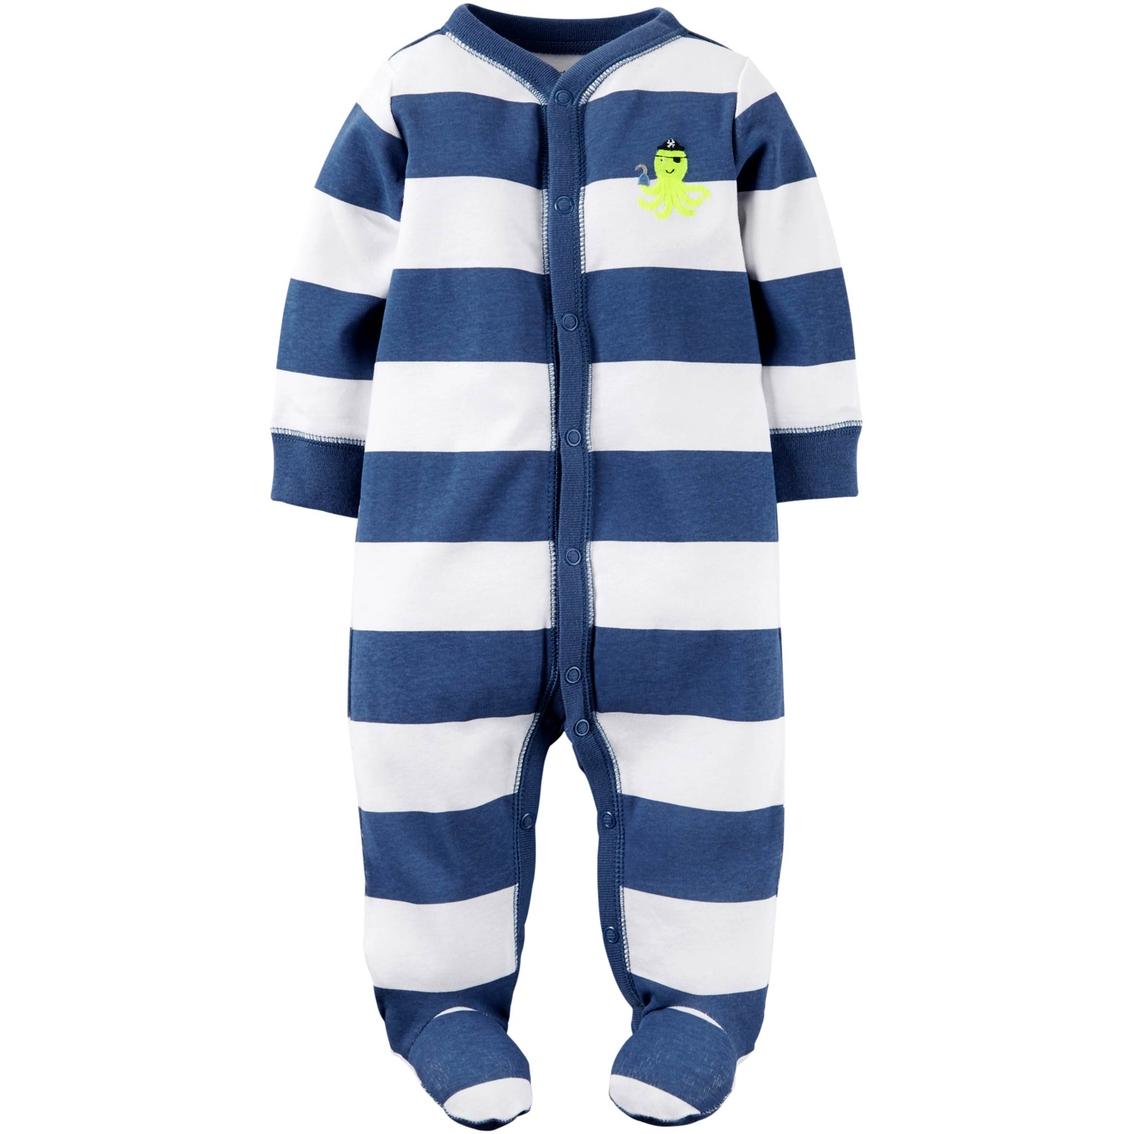 a4f84bce9cf4 Carter s Infant Boy Octopus Stripe Snap-up Sleep And Play